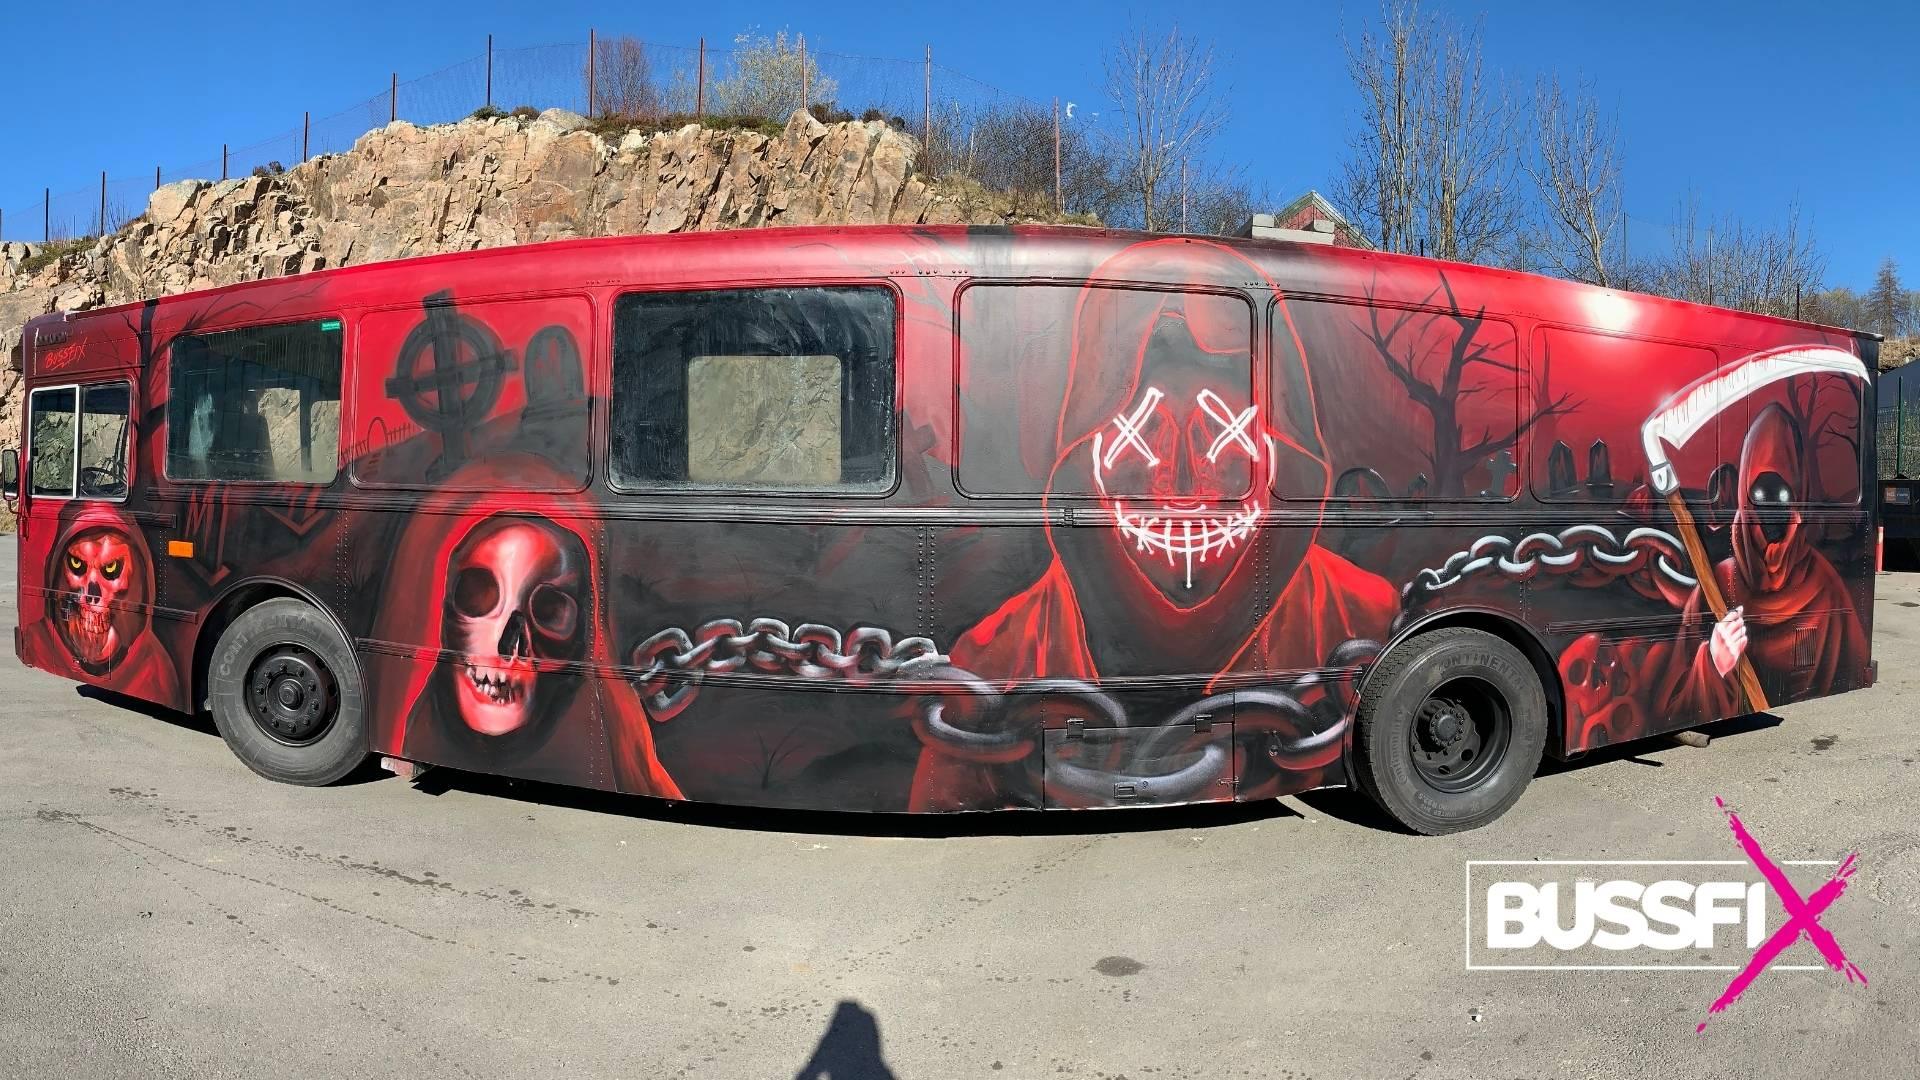 Graffiti russebuss Nightmare 2019